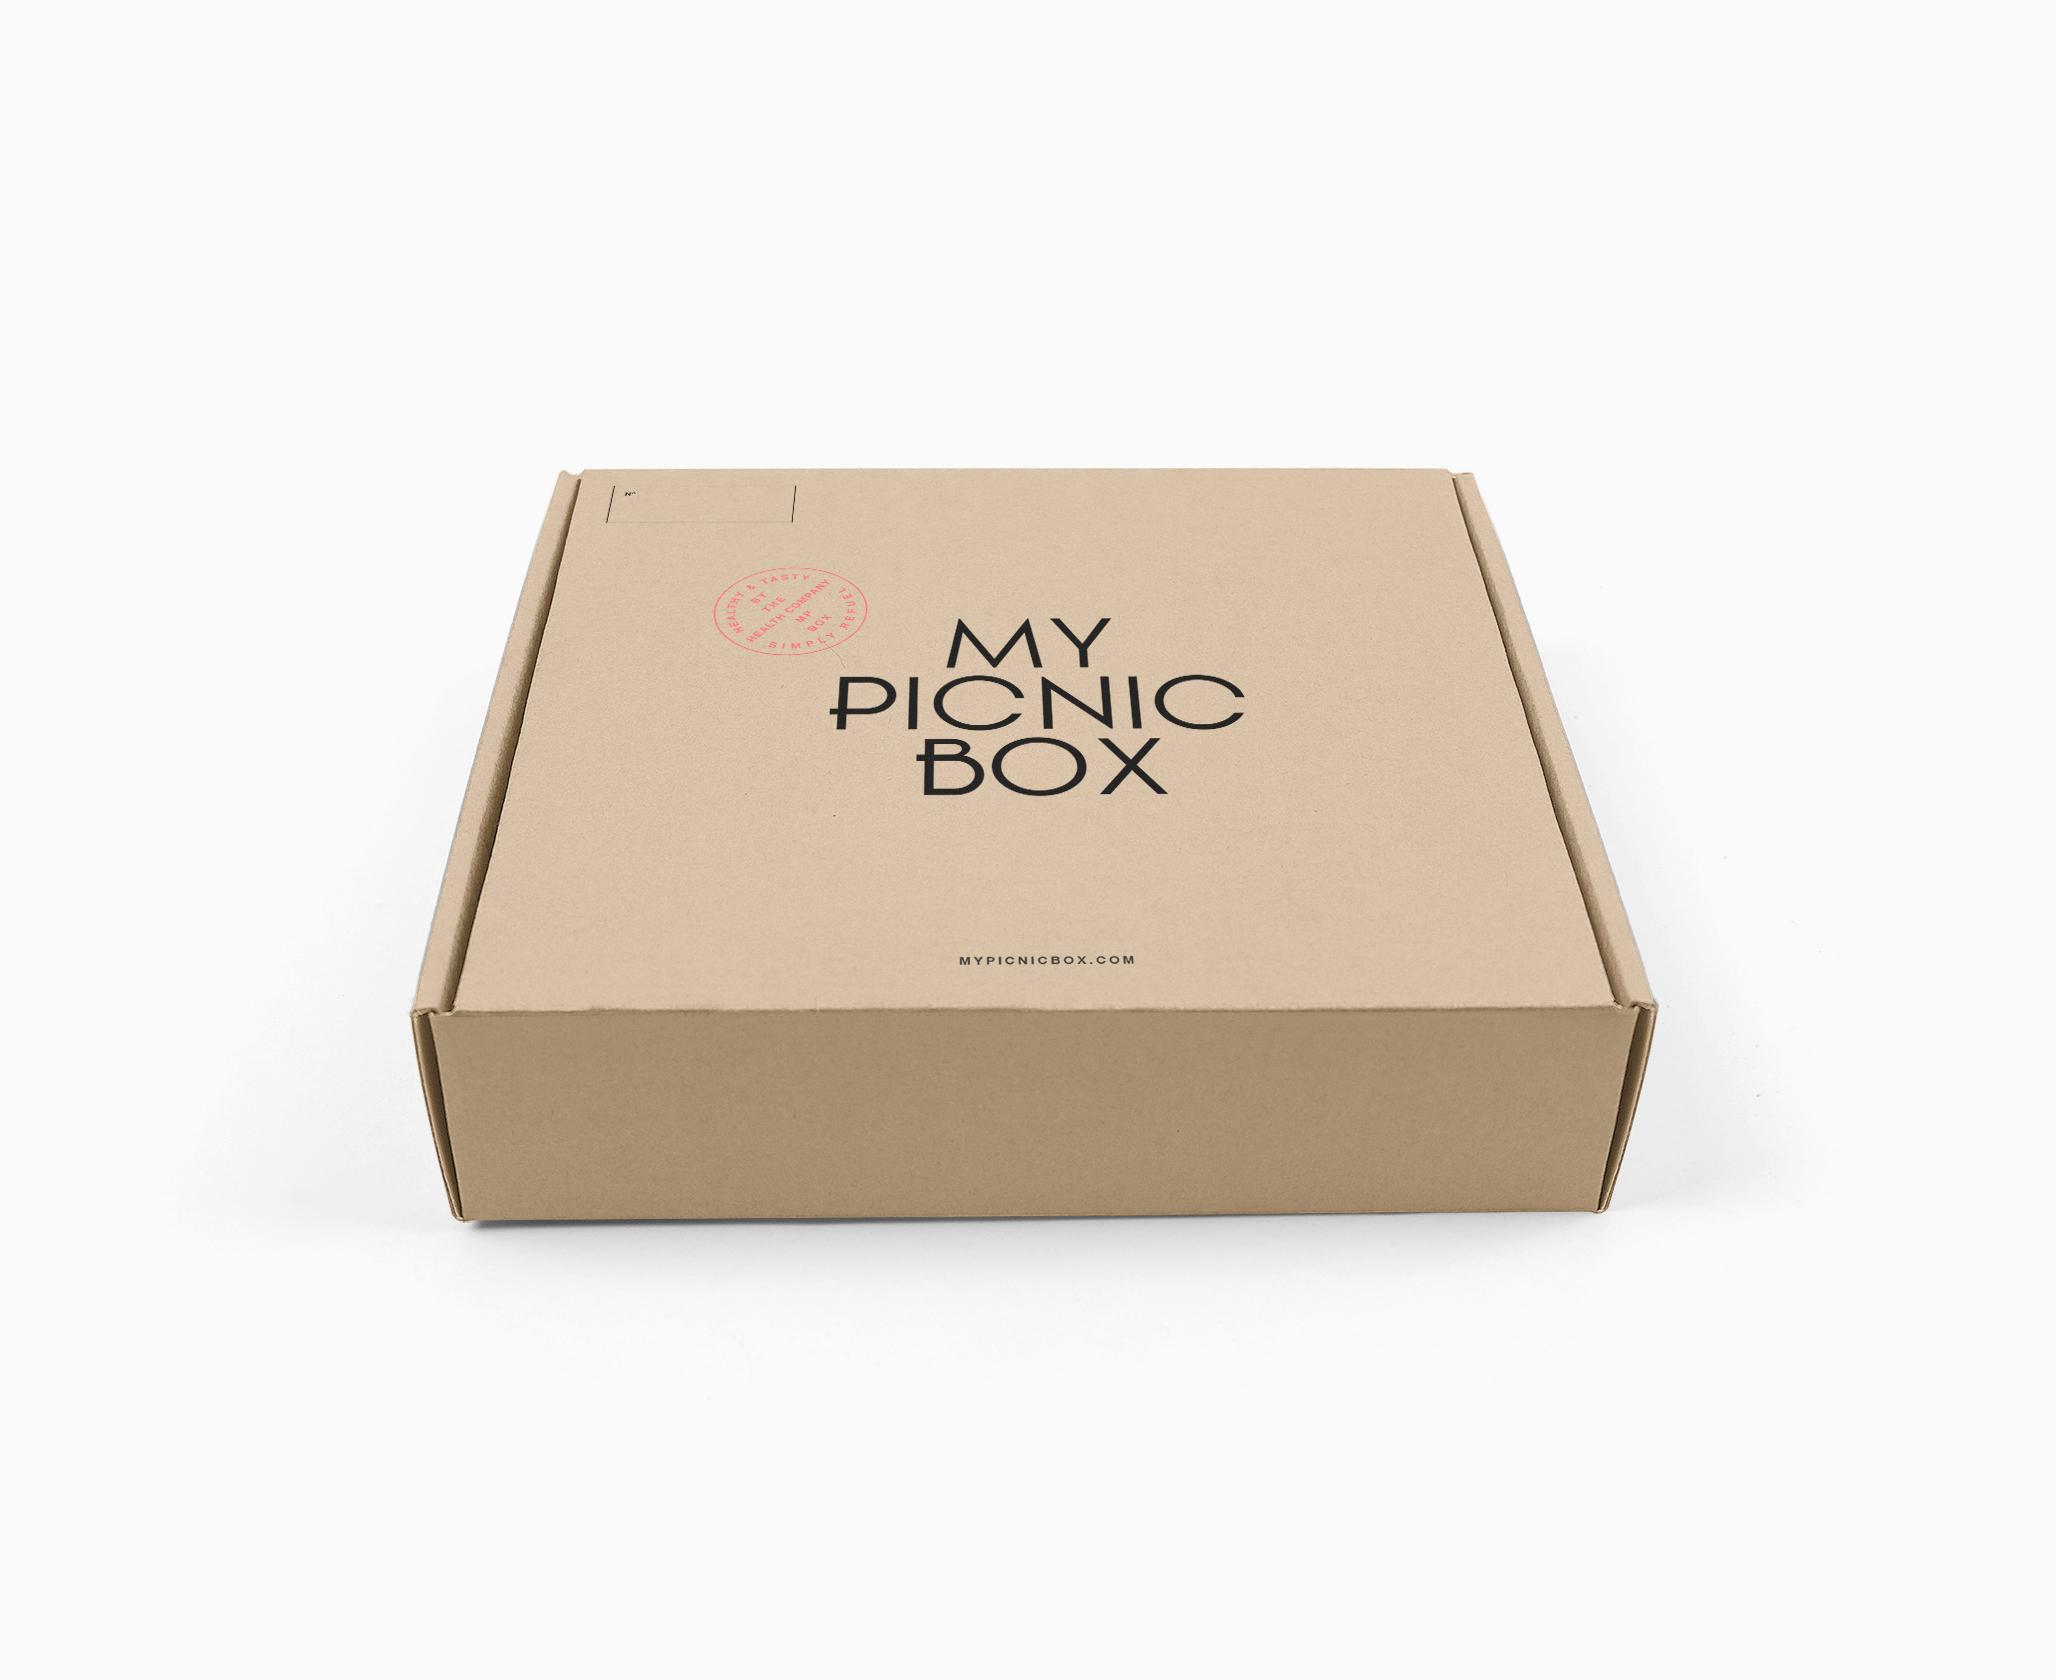 MPB_BOX_v3